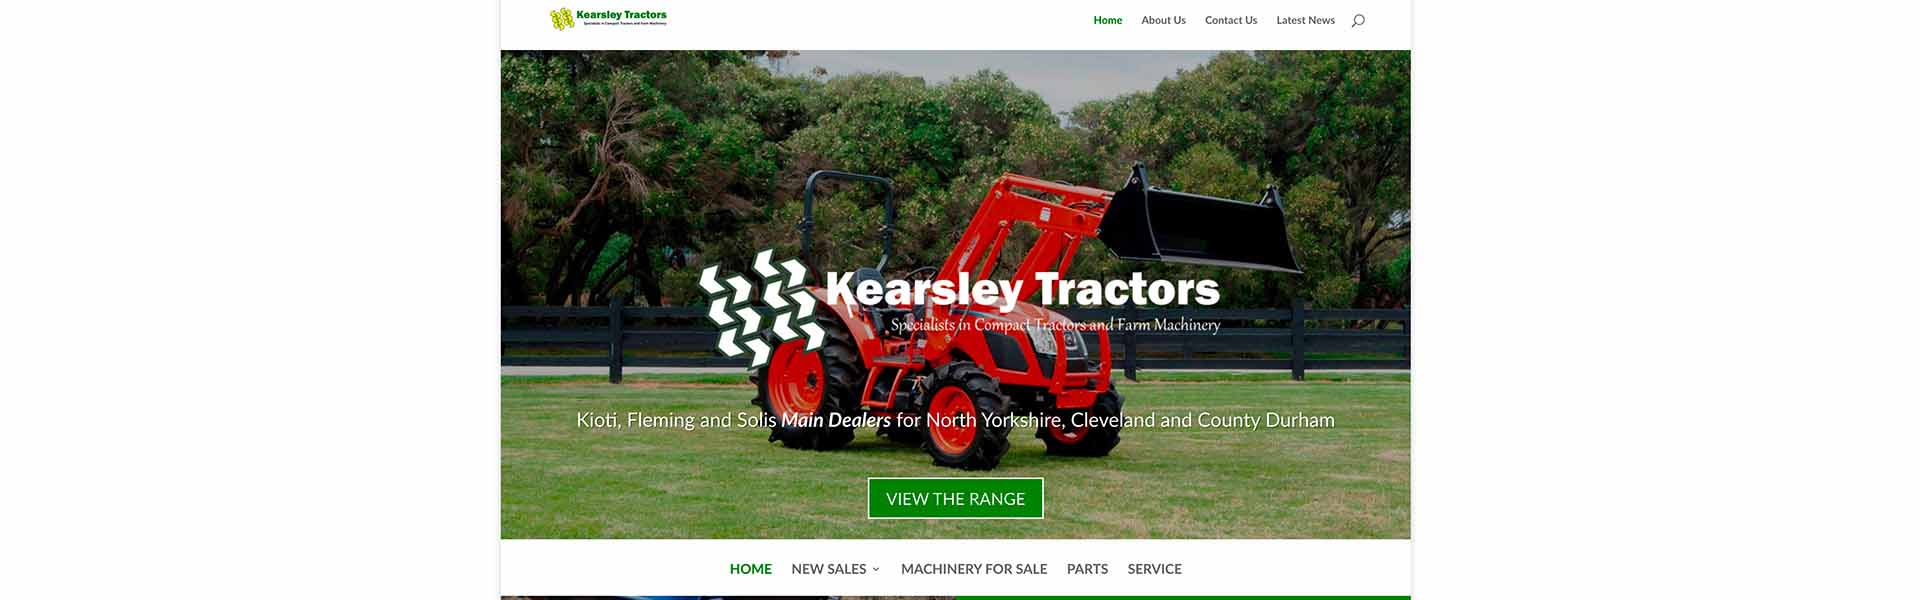 Web Design UK Portfolio Kearsley Tractors